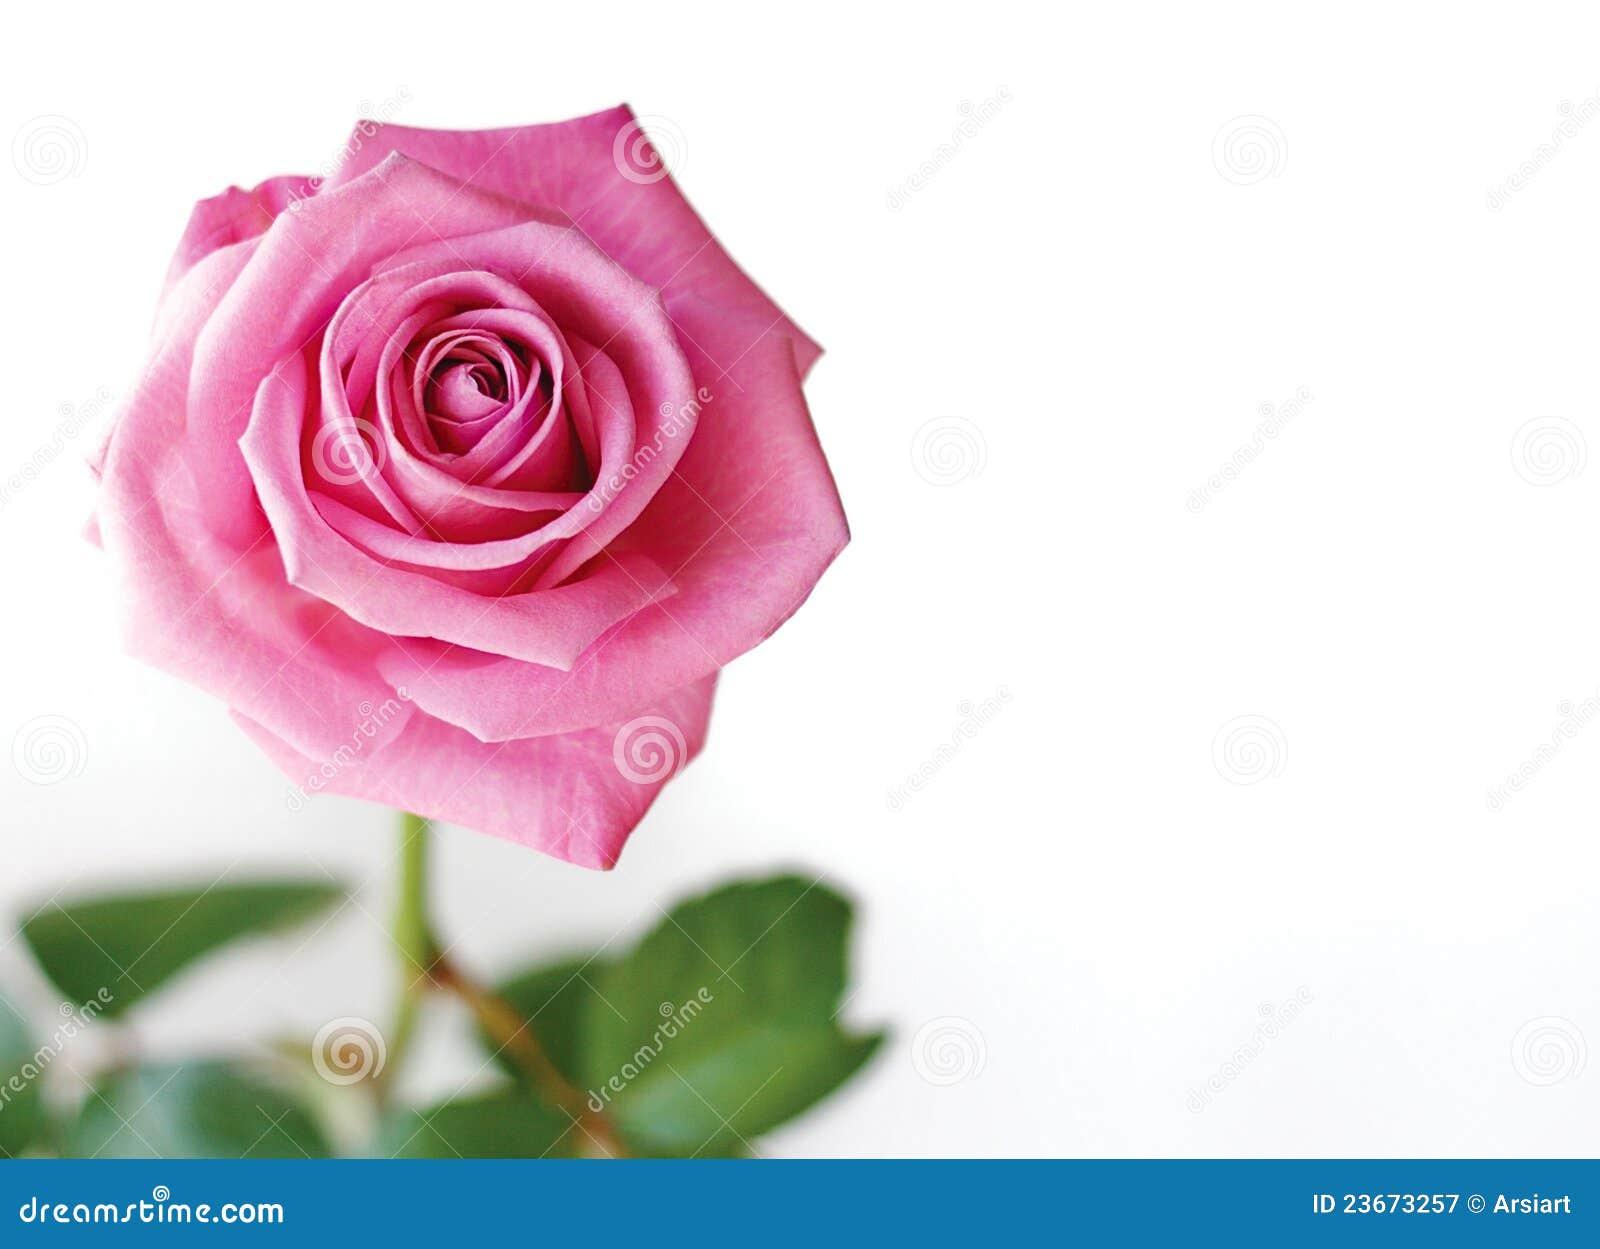 Beautiful Pink Rose. Stock Image. Image Of Closeup, Beauty